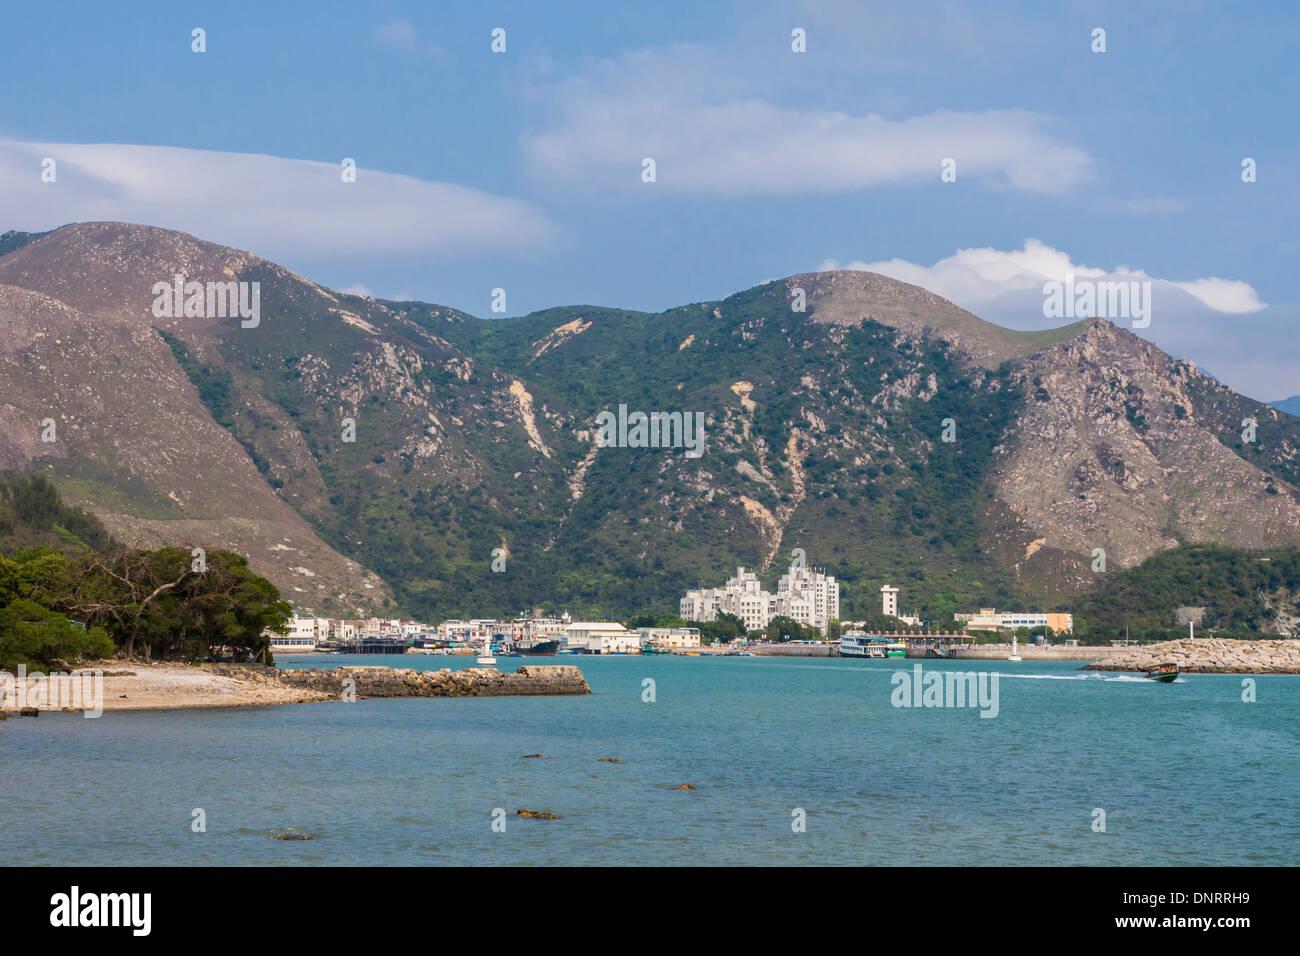 Landscape of Lantau Island, Hong Kong, China - Stock Image